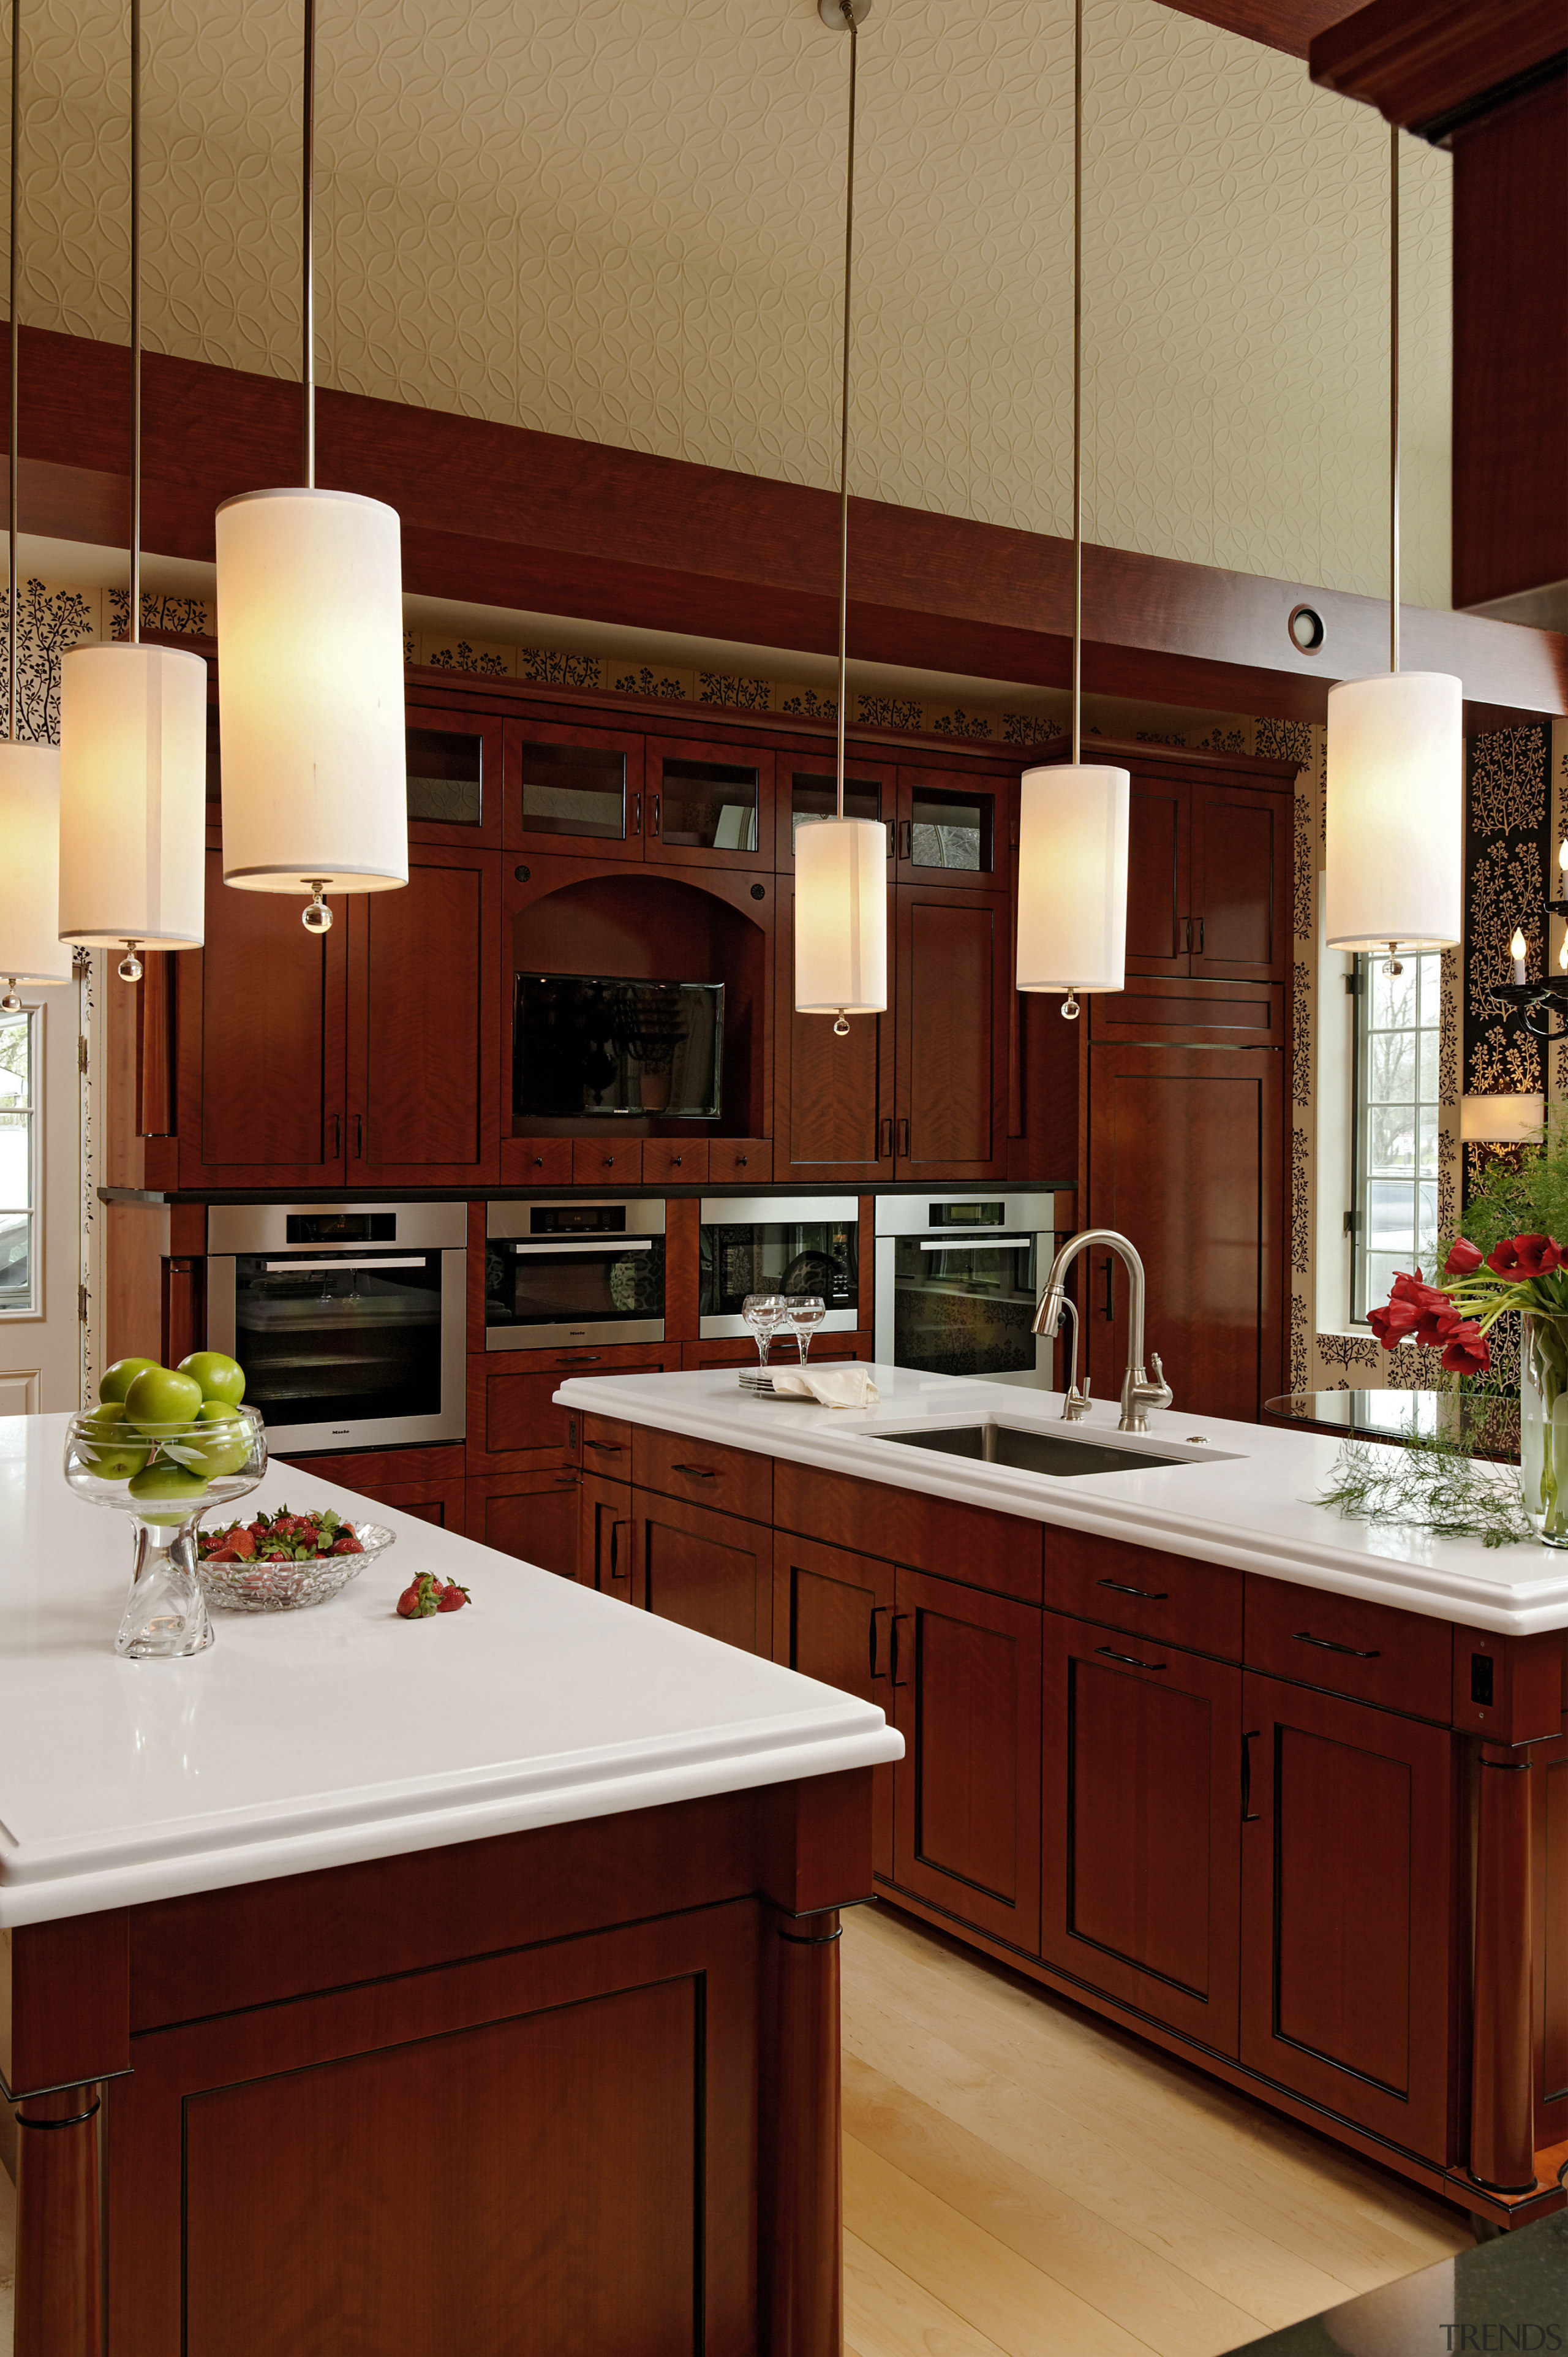 Biedermeier-style traditional kitchen - Biedermeier-style traditional kitchen - cabinetry, countertop, cuisine classique, interior design, kitchen, room, red